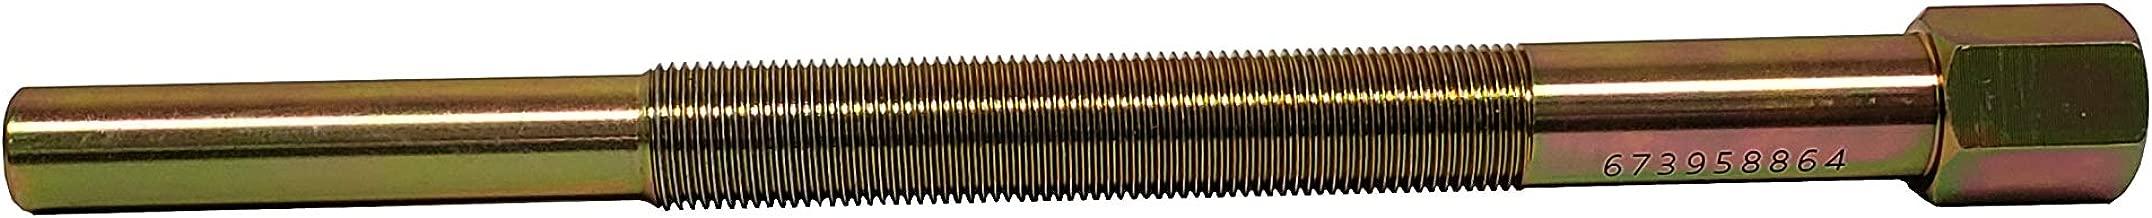 East Lake Axle Clutch Puller Tool compatible with Polaris Kawasaki Suzuki Arctic Cat 1985-2015 2870506 57001-1404